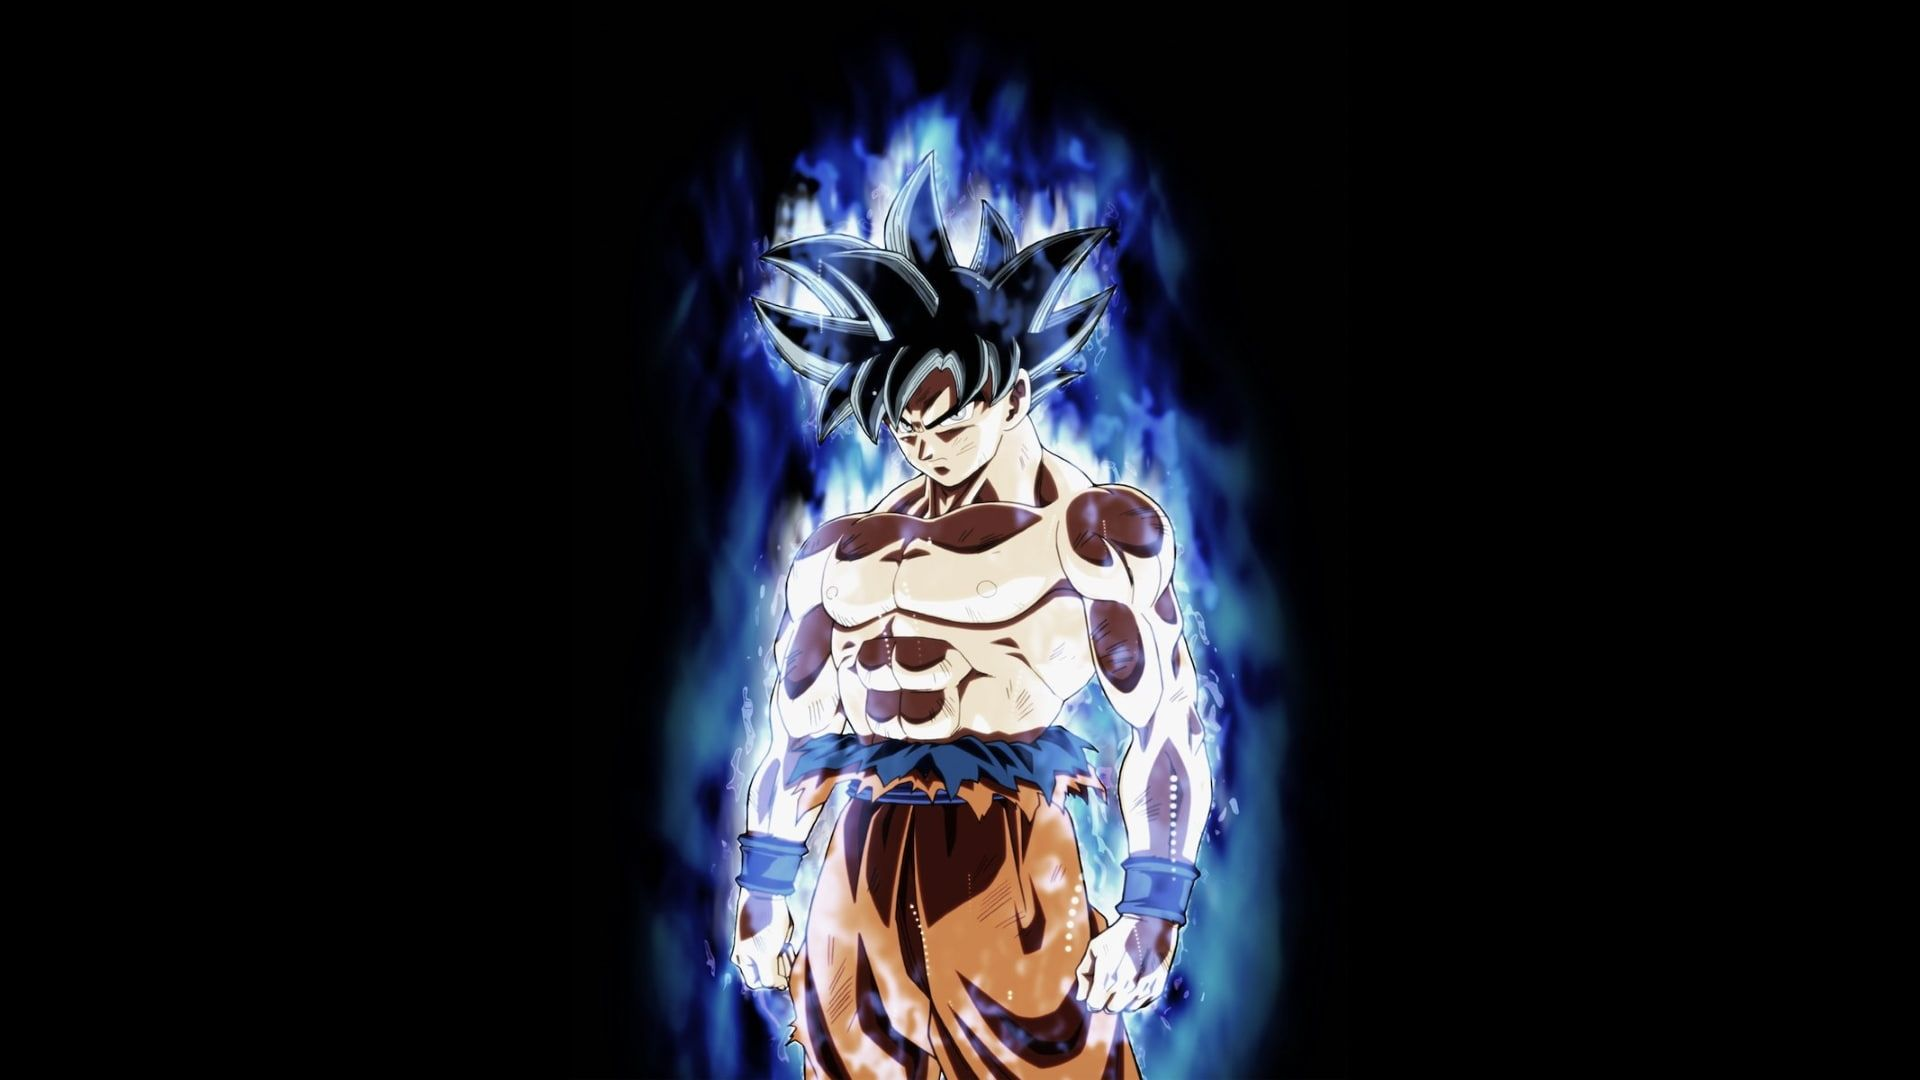 Dragonball Goku Ultra Instinct Live Wallpaper